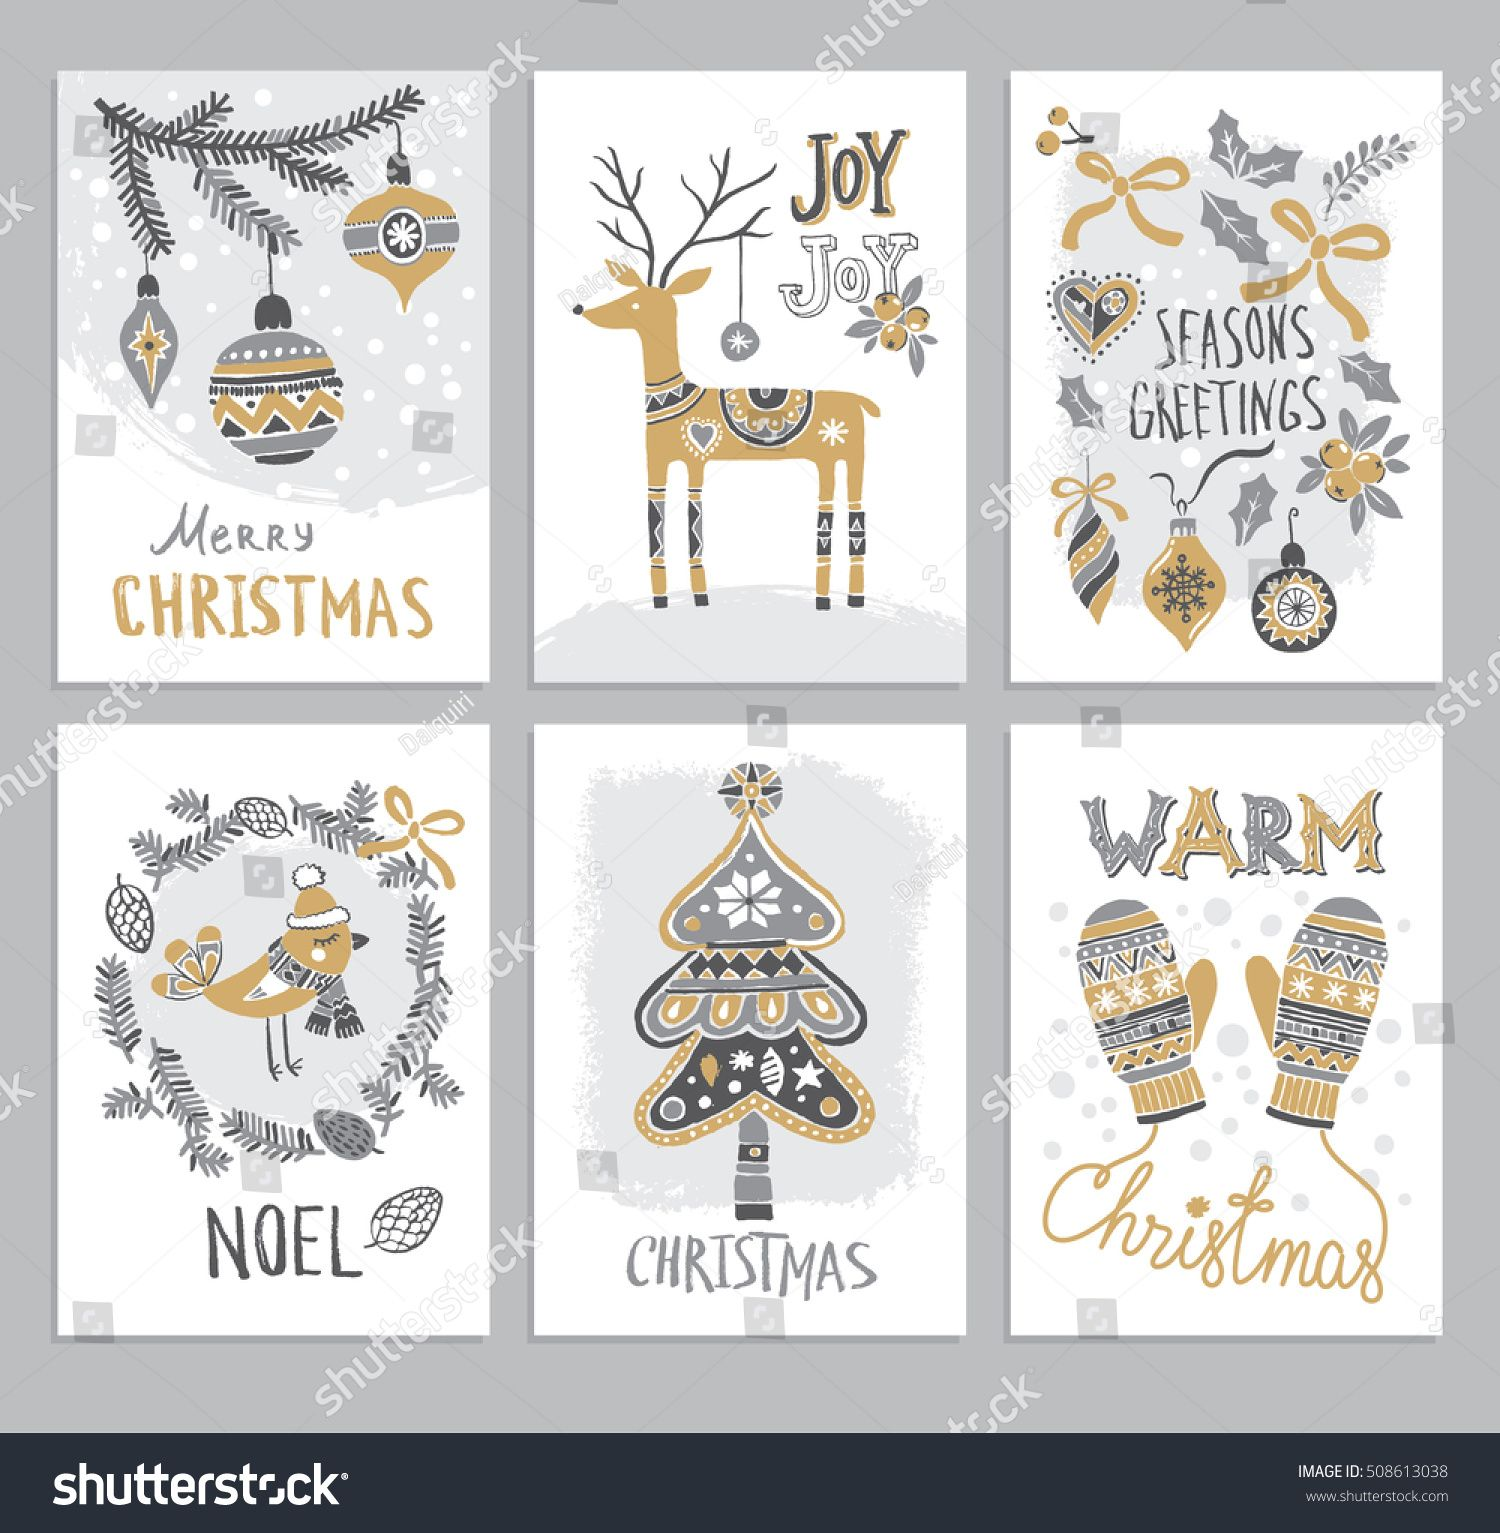 Christmas Hand Drawn Cards With Christmas Tree, Fir Branch, Deer,